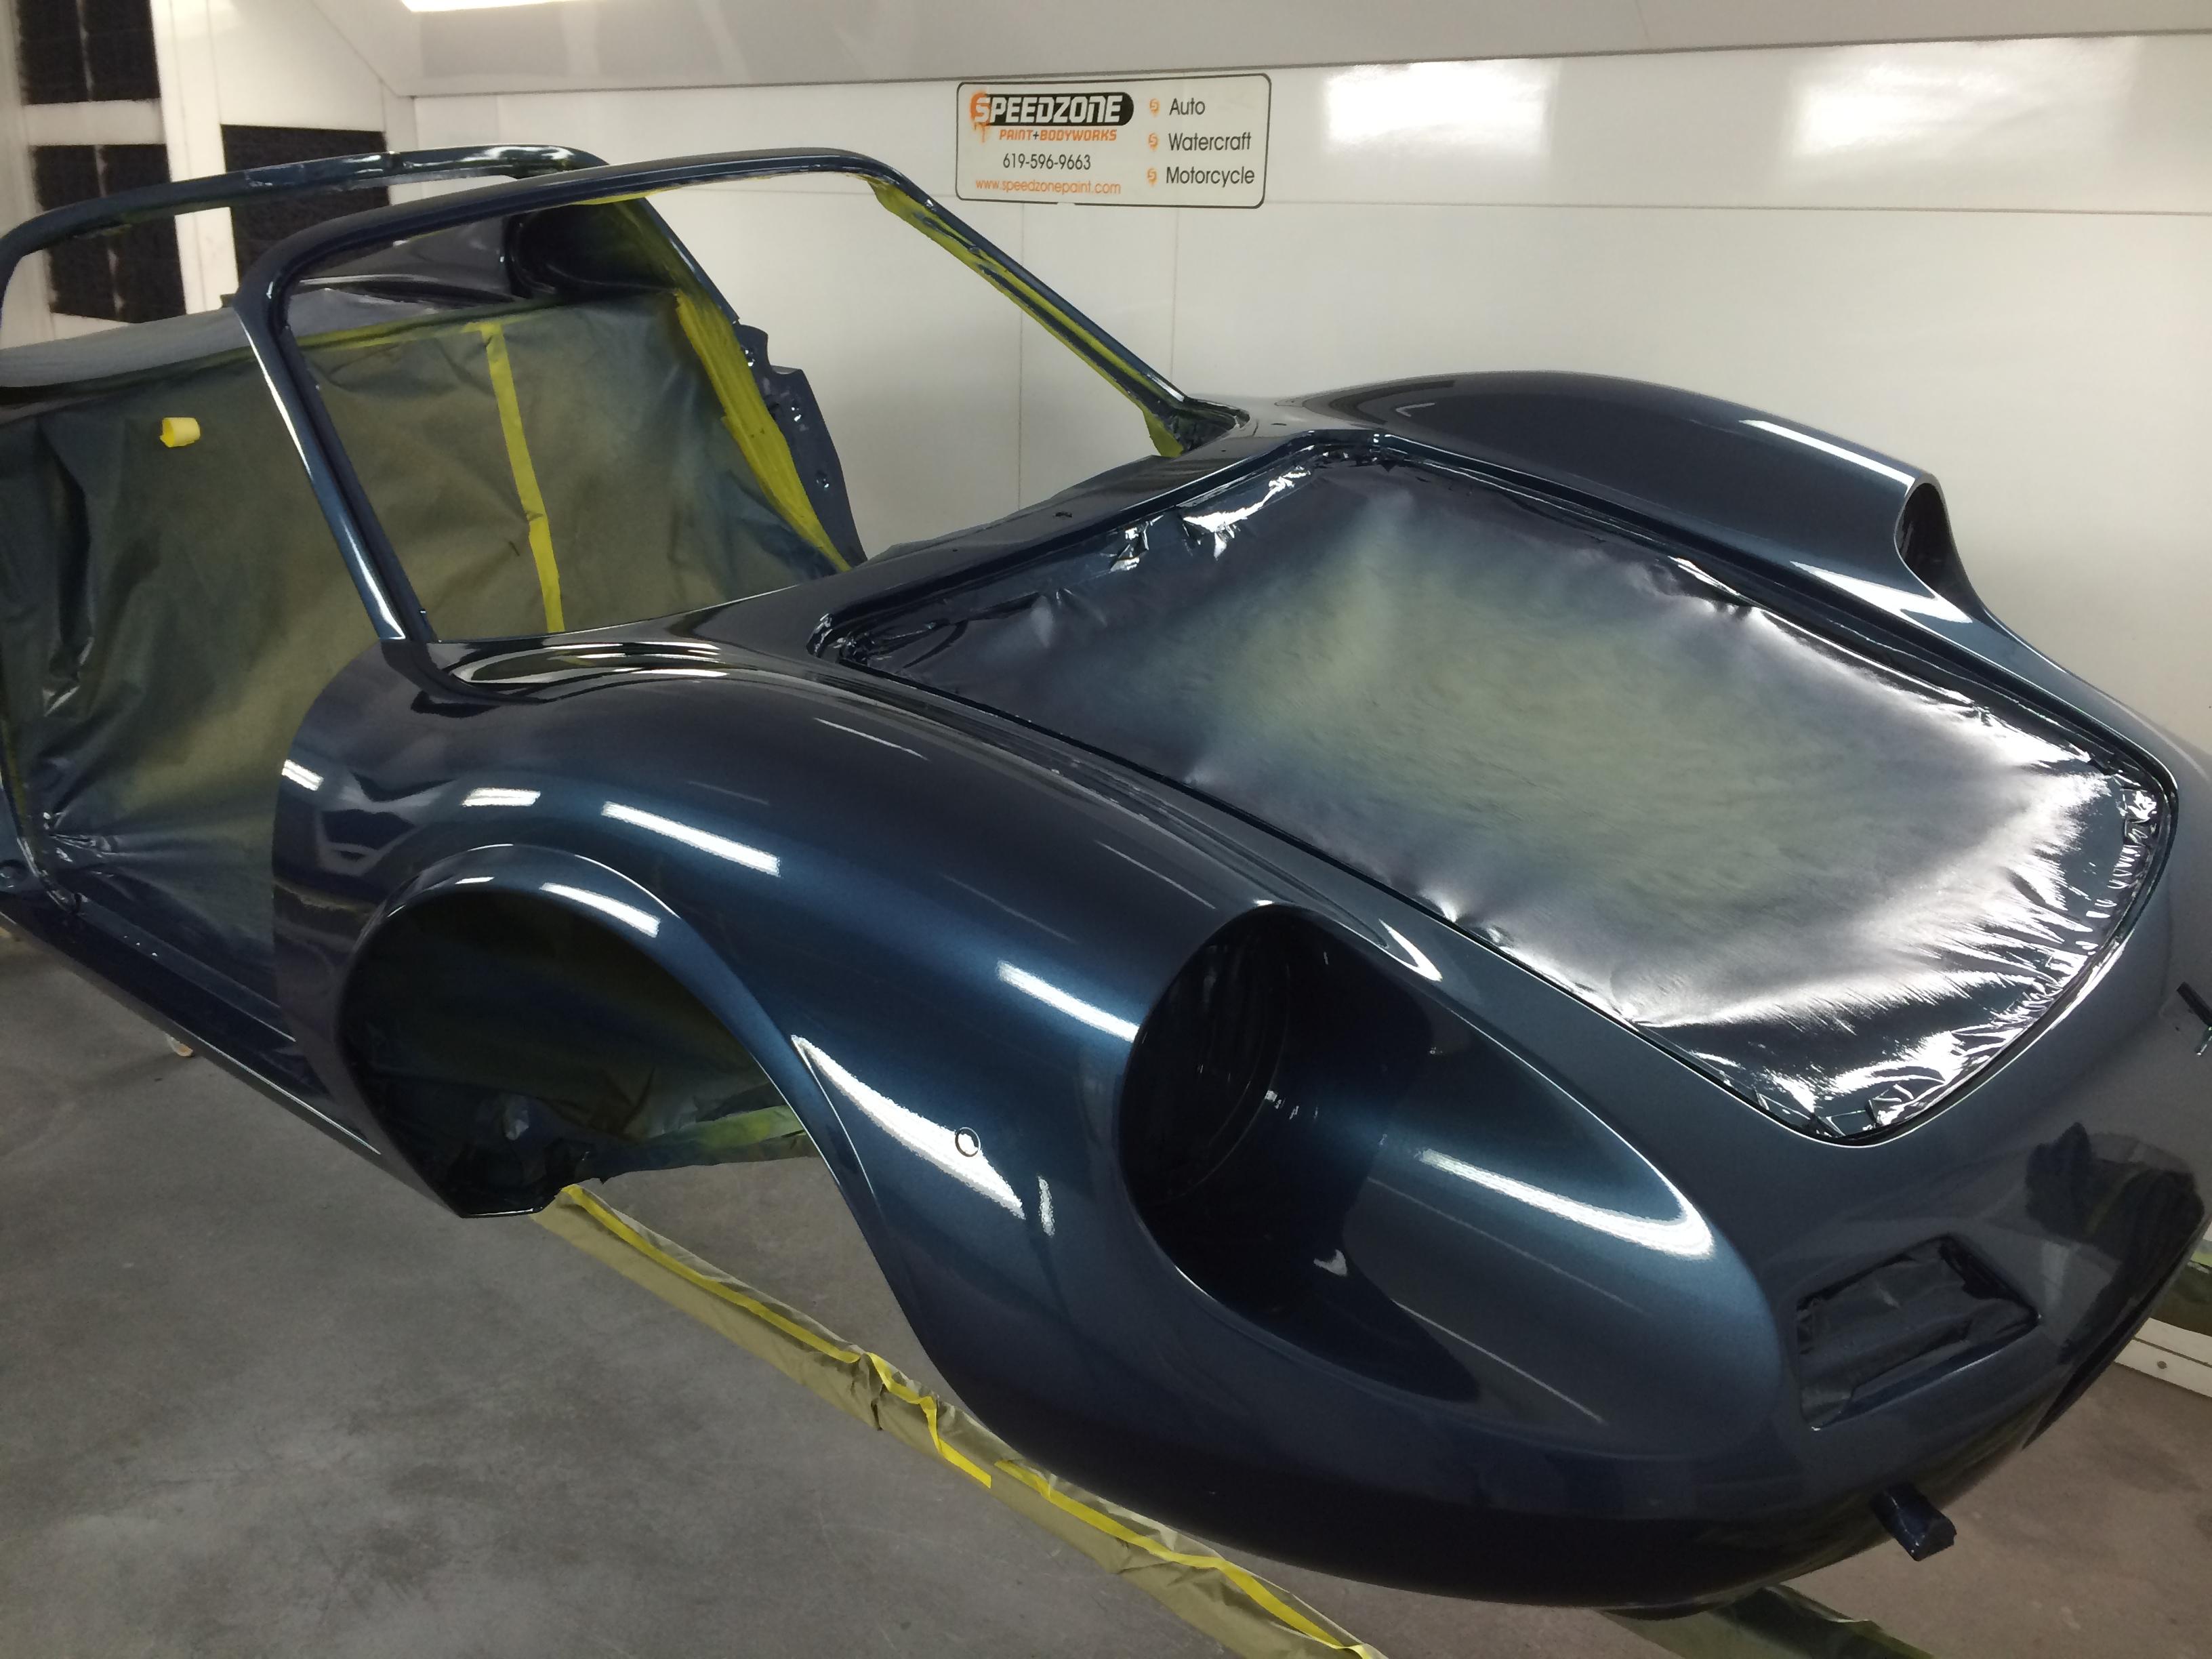 Ferrari Dino 246 Blue Sera Metallizzato, omgjon, Dino restoration, Jon Gunderson